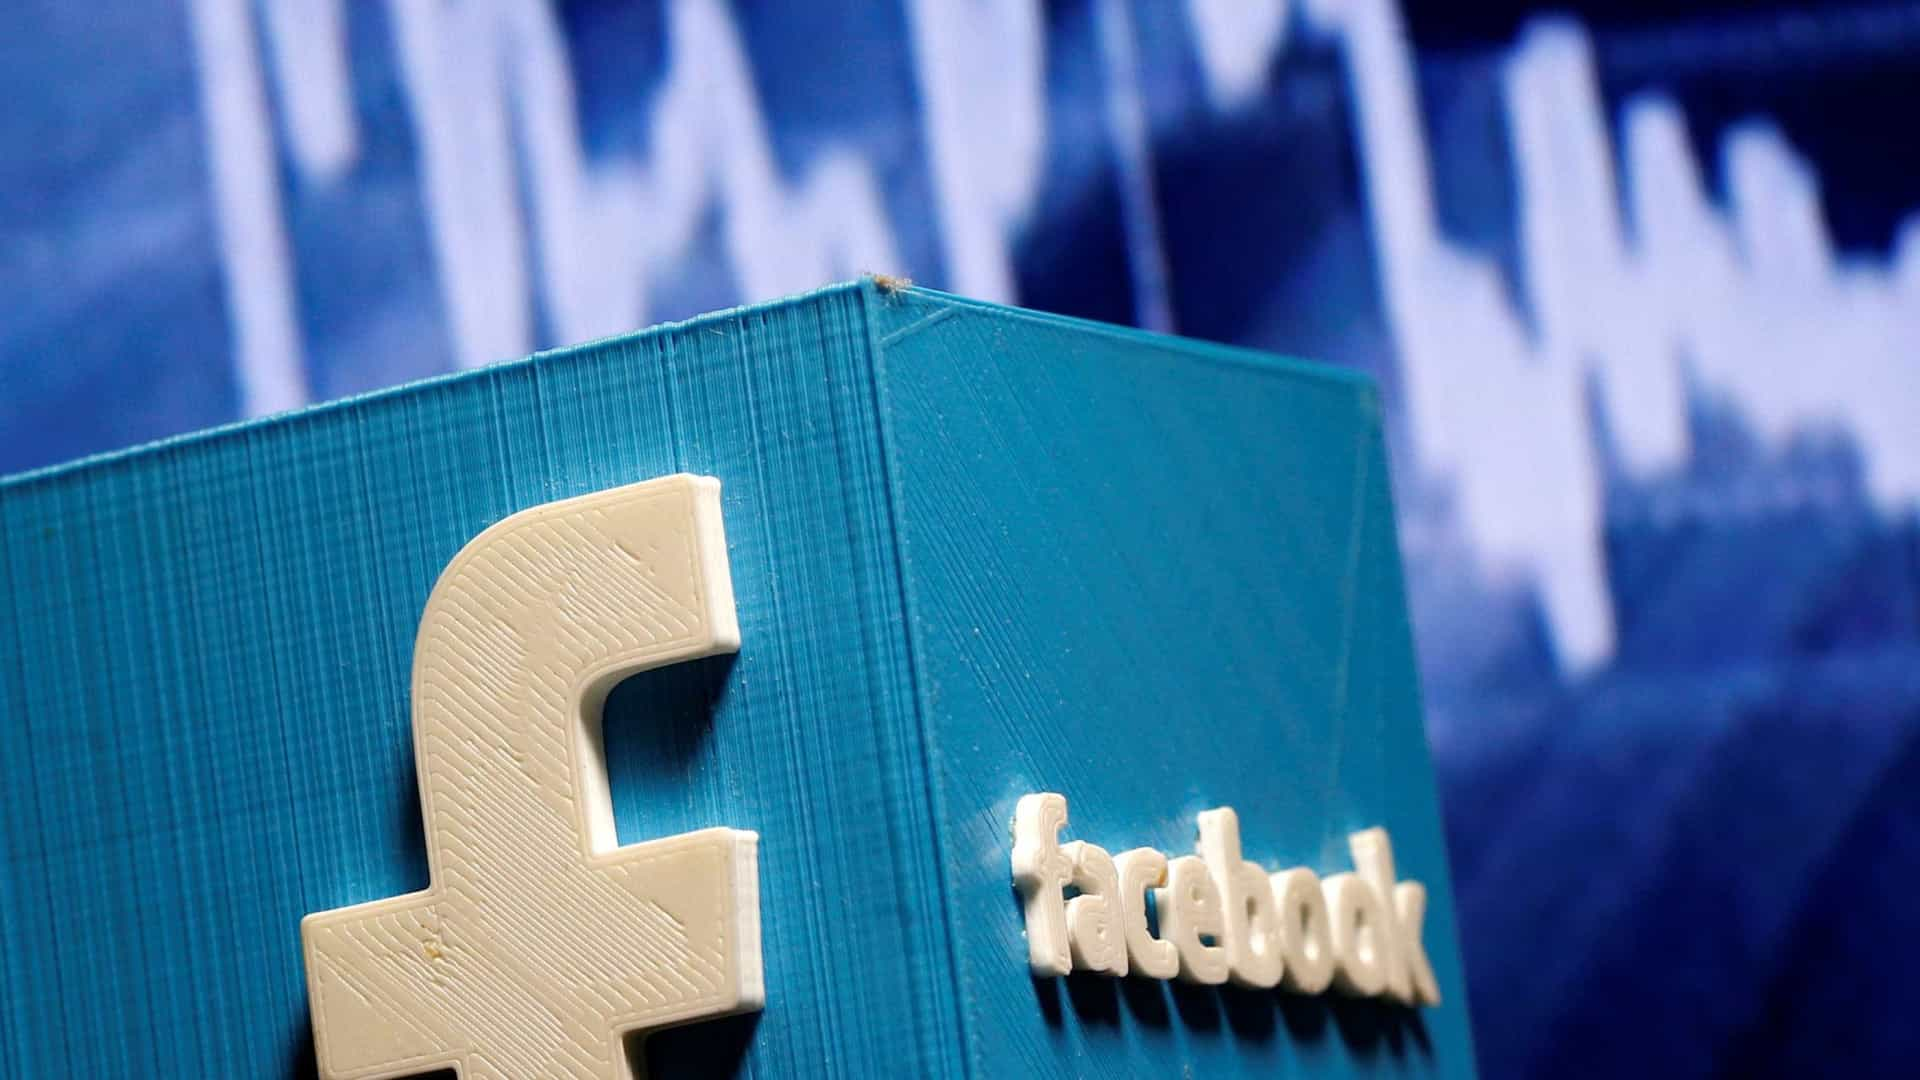 Facebook: Erro publicou 'posts' privados de 14 milhões de utilizadores